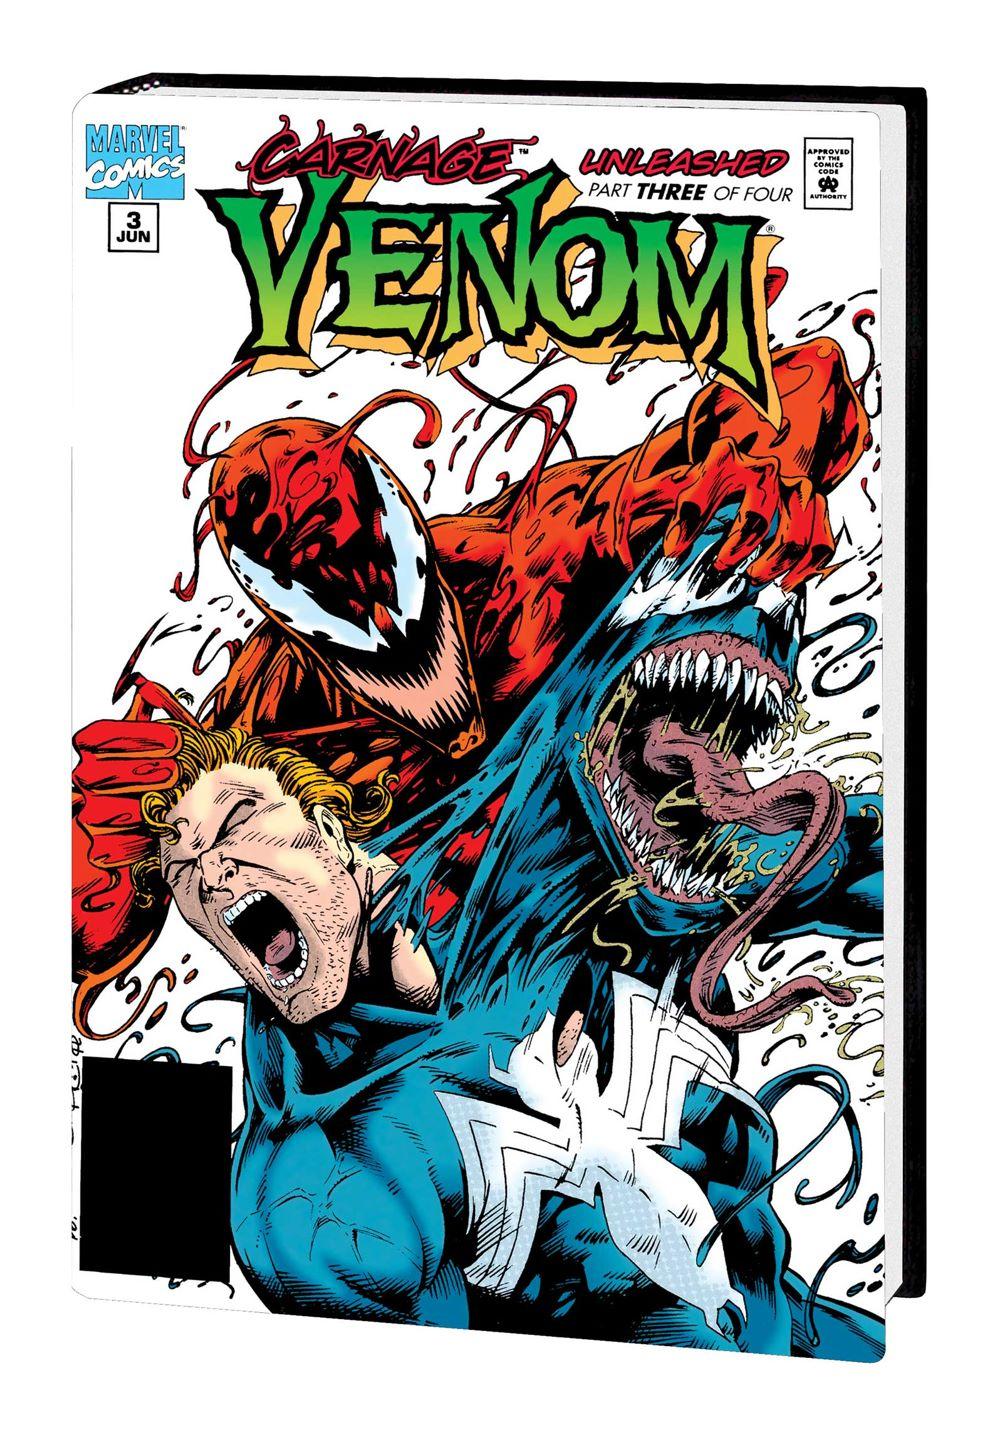 VENOM_OMNIBUS_V1_HC_DM Marvel Comics January 2021 Solicitations